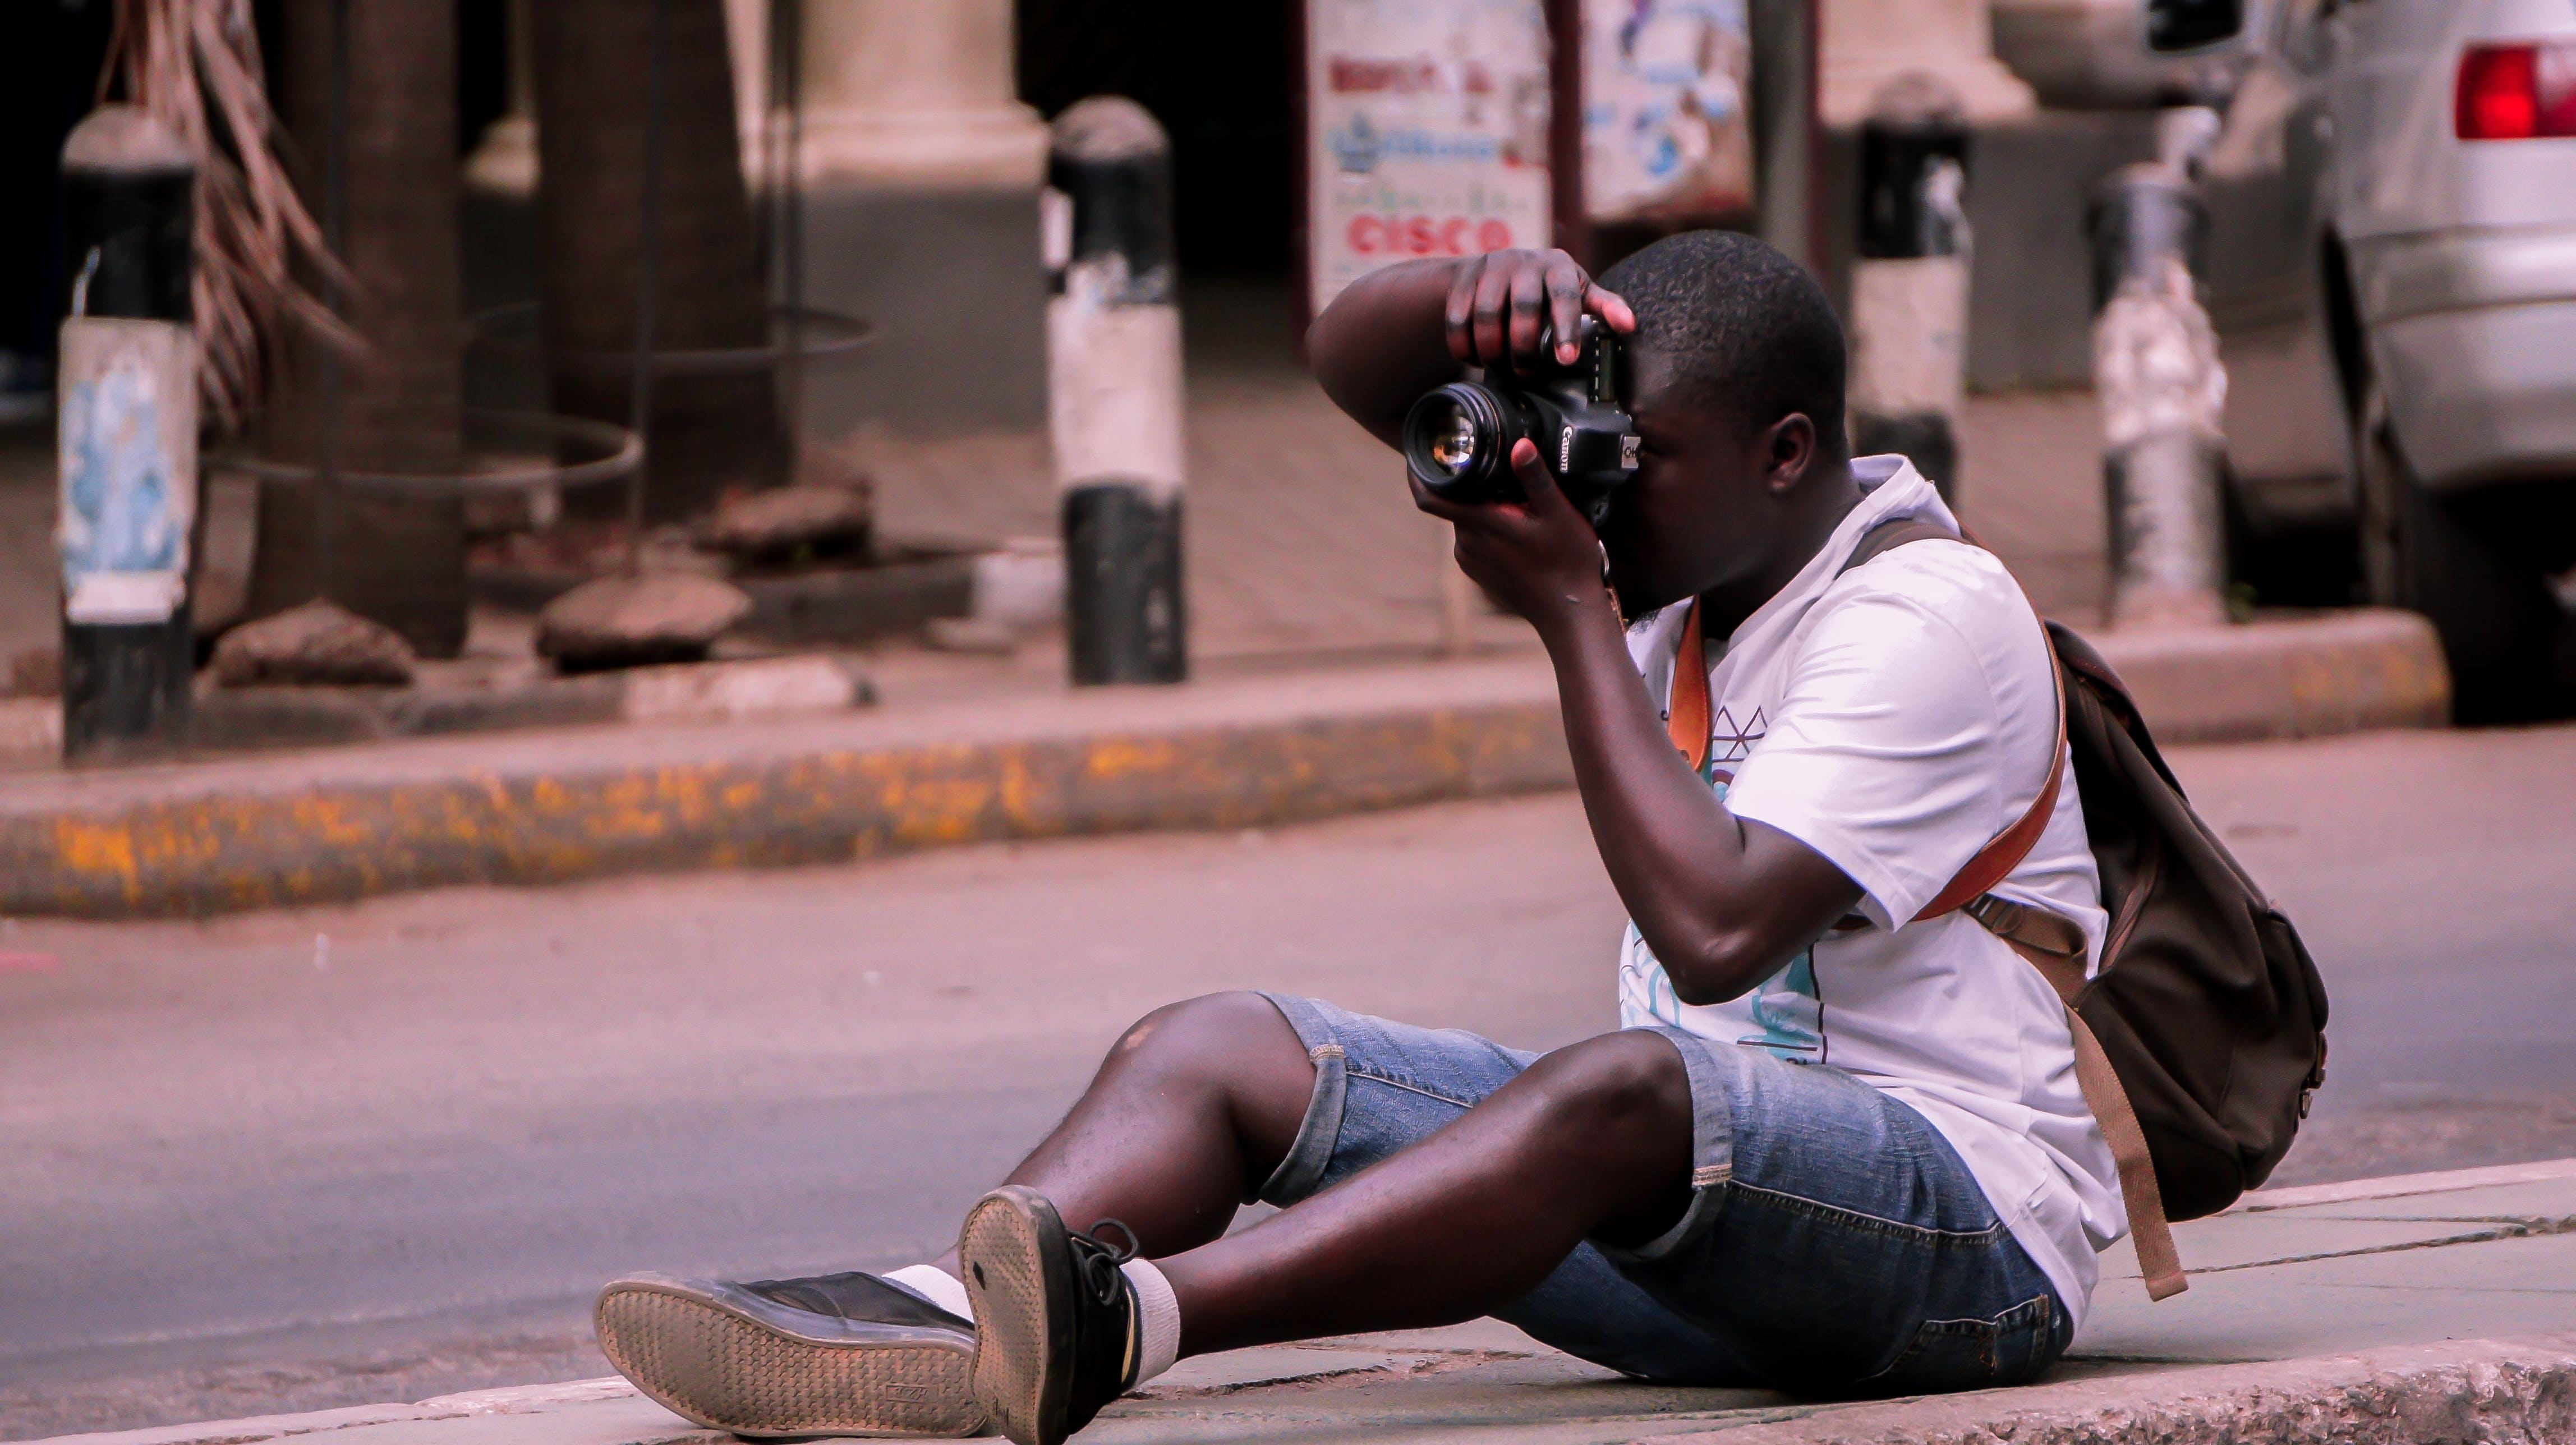 Free stock photo of africa, Kenya, Nairobi, outdoorchallenge